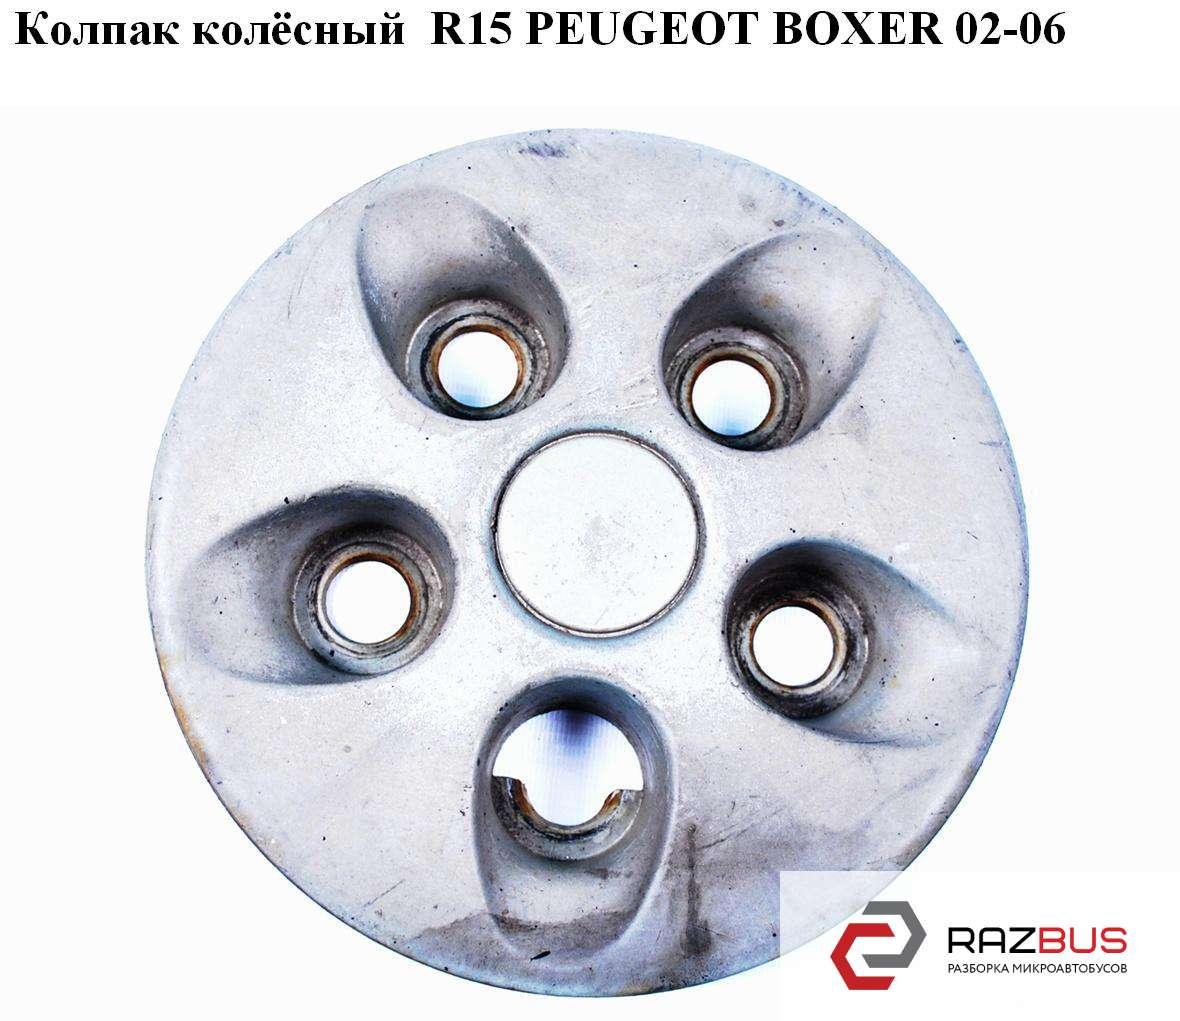 5416J4 Колпак колёсный R15 PEUGEOT BOXER II 2002-2006г